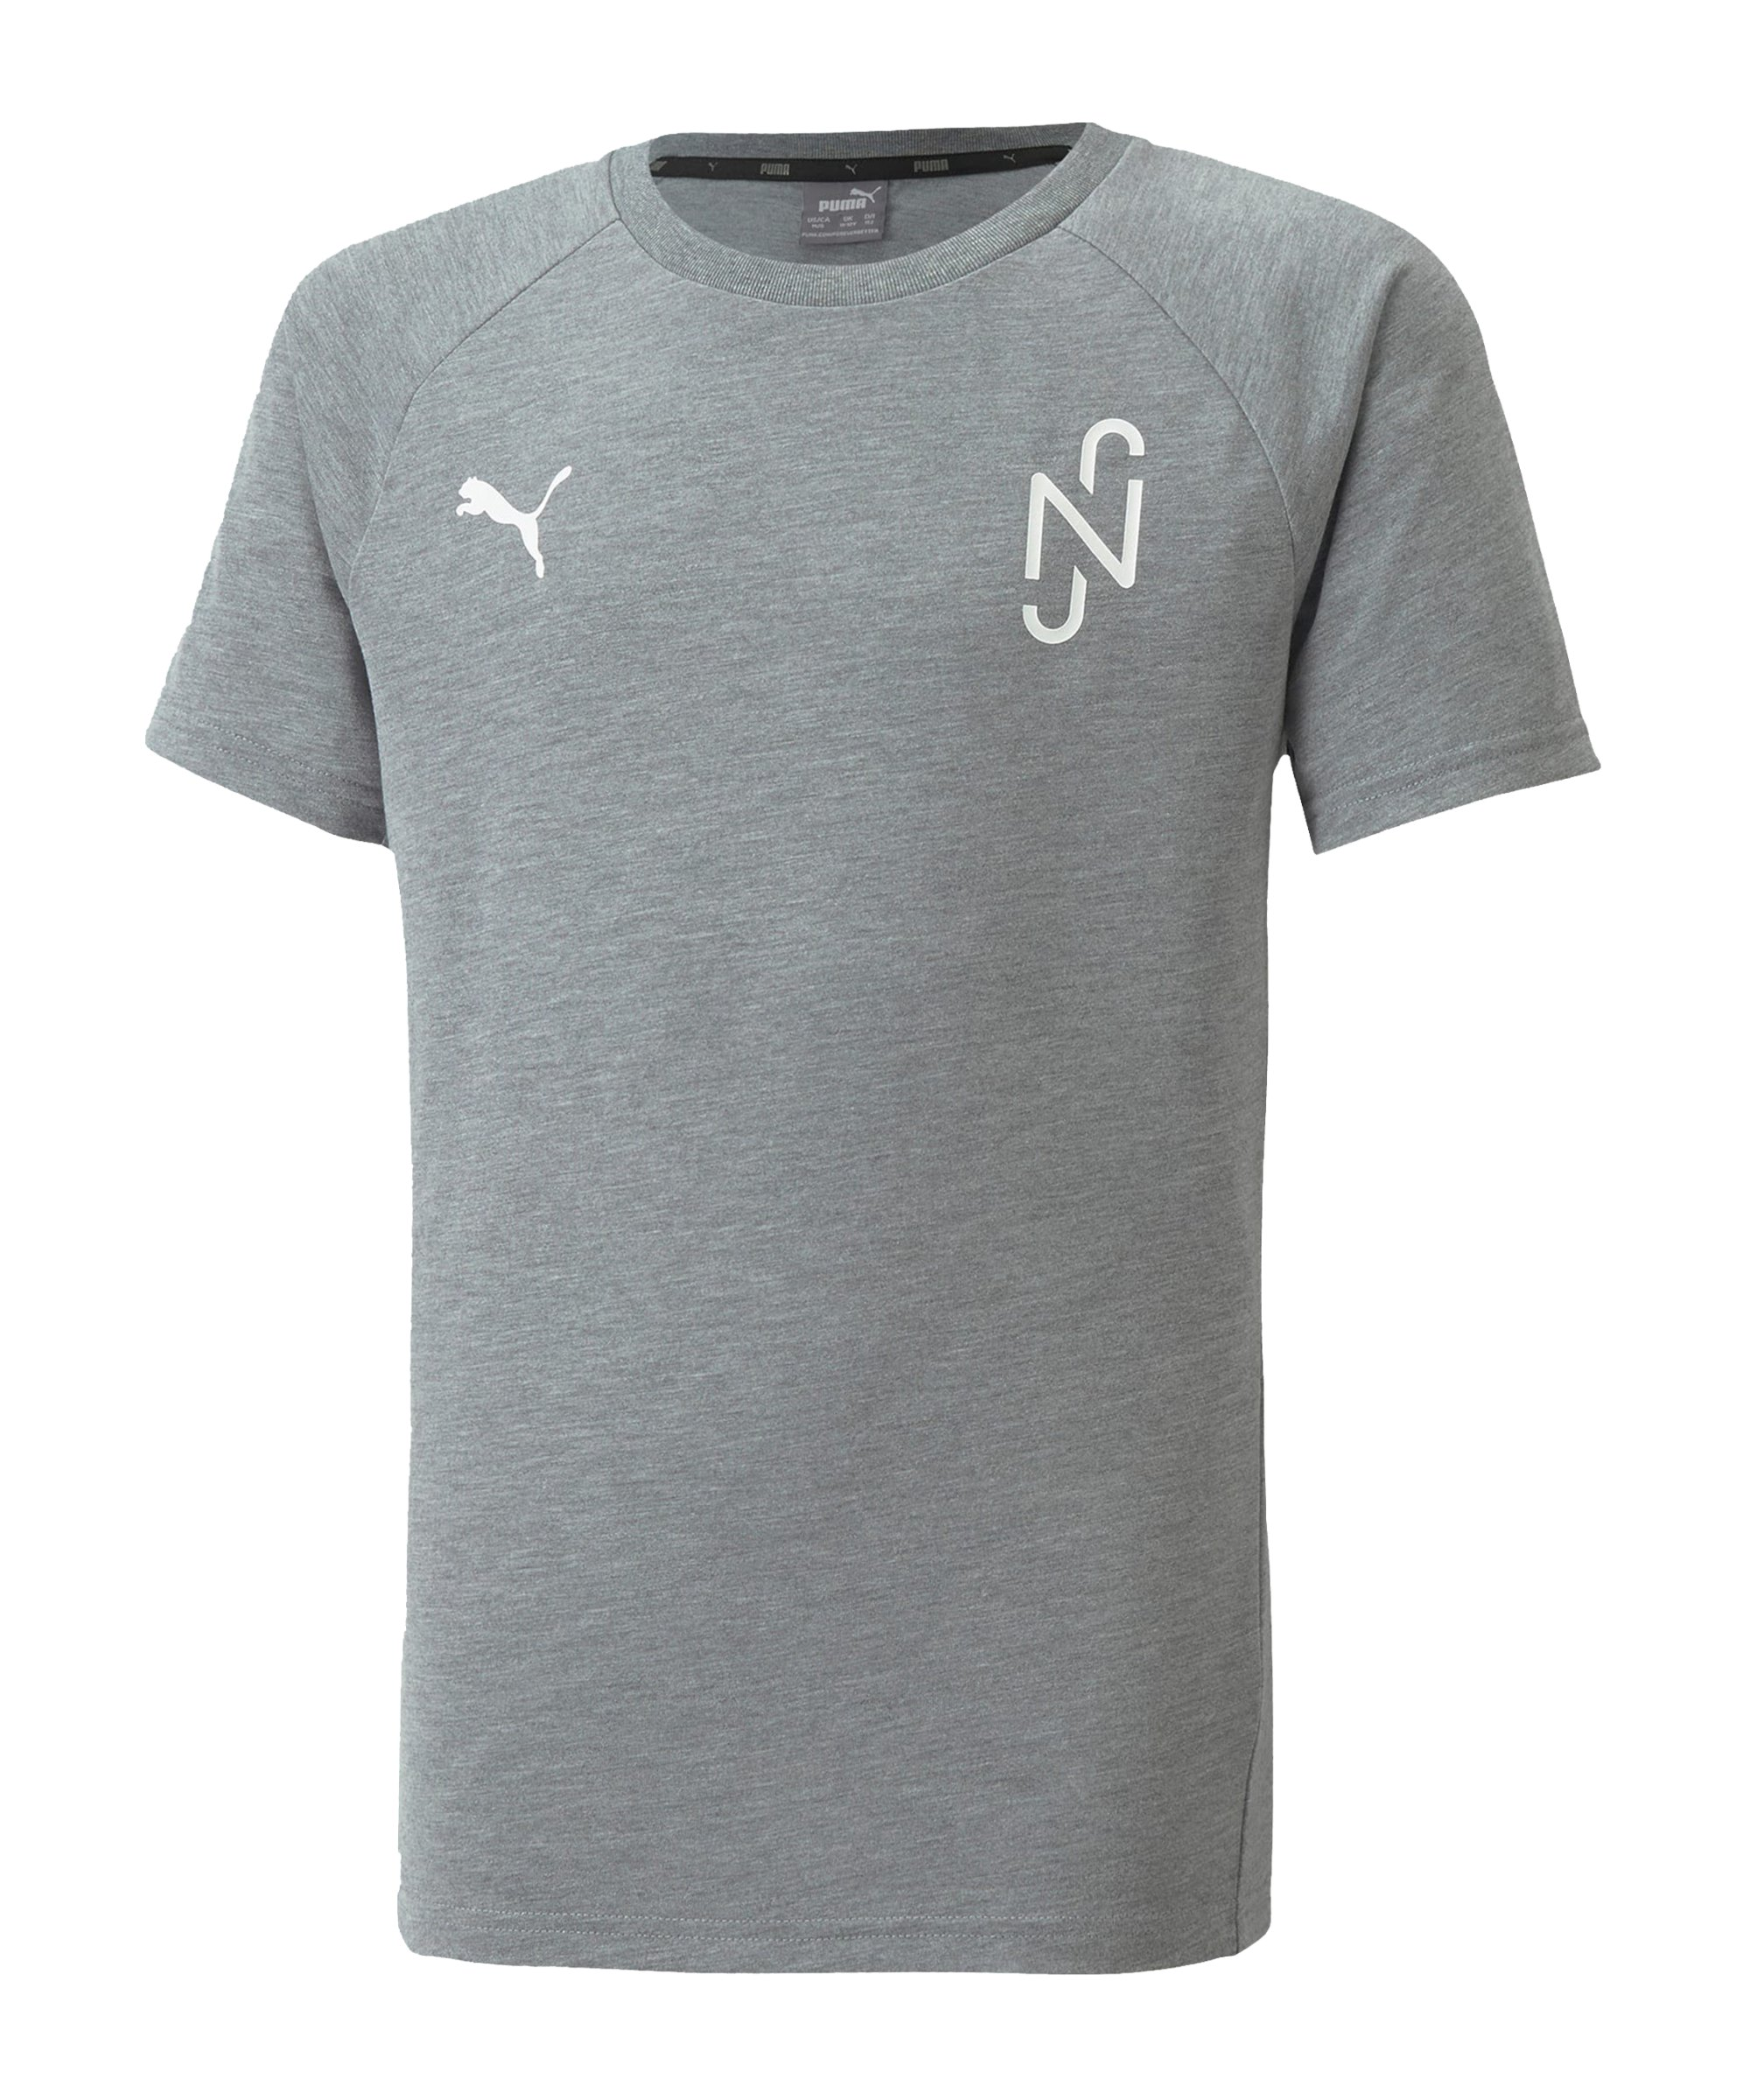 PUMA NJR Evostripe T-Shirt Kids Grau F05 - grau